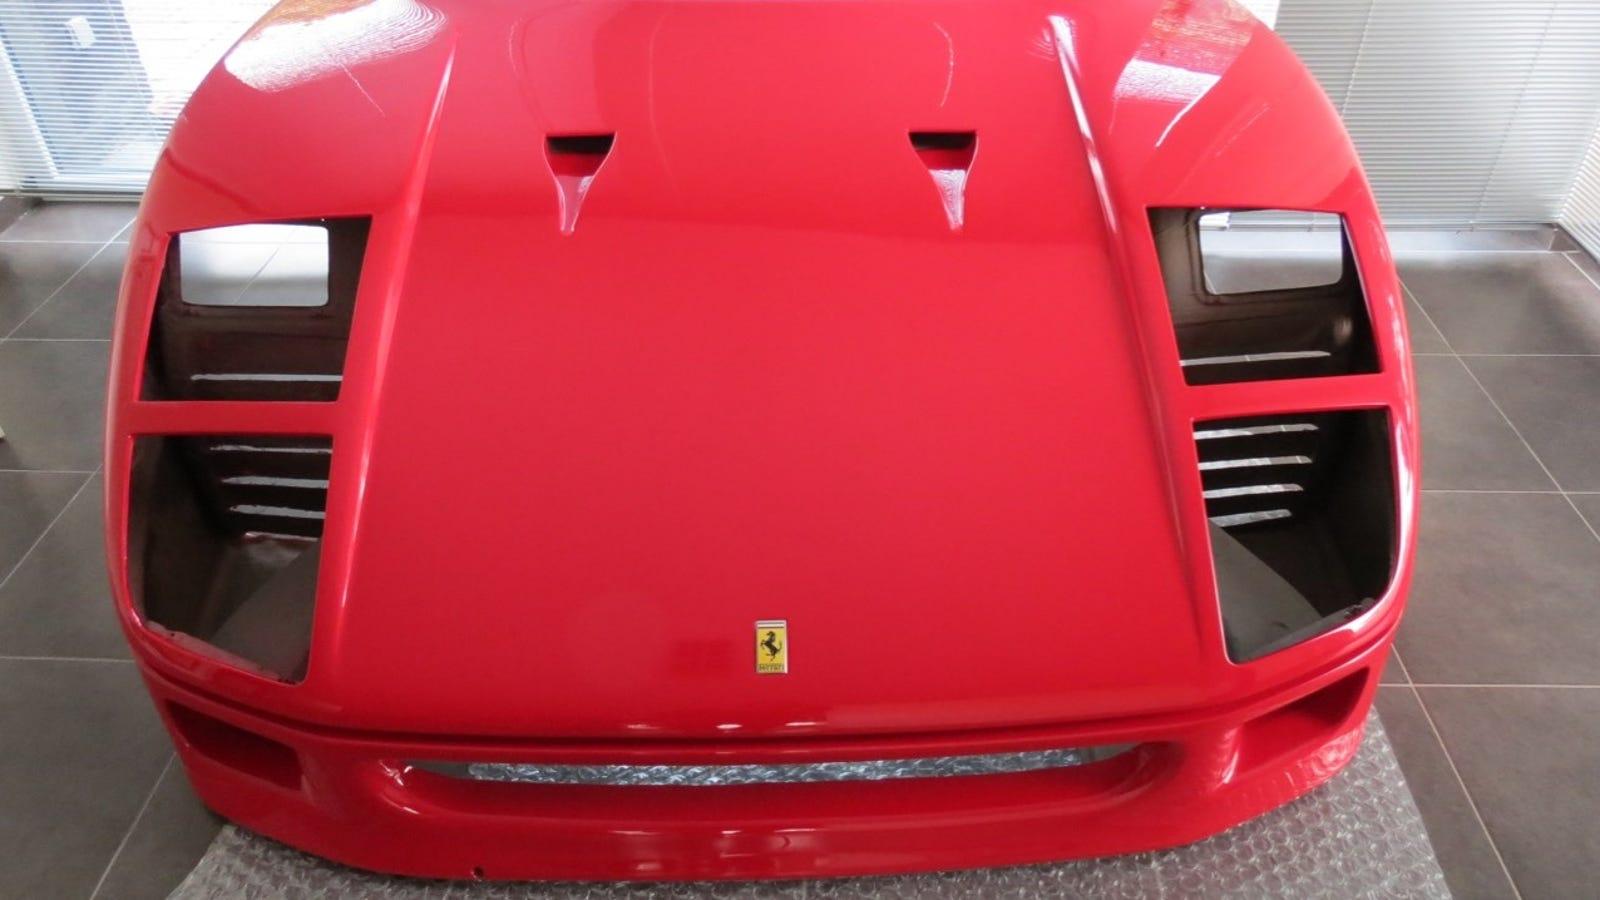 Ferrari F40 Hood For Sale, I Hope Your Pontiac Fiero Body Kit Is Ready